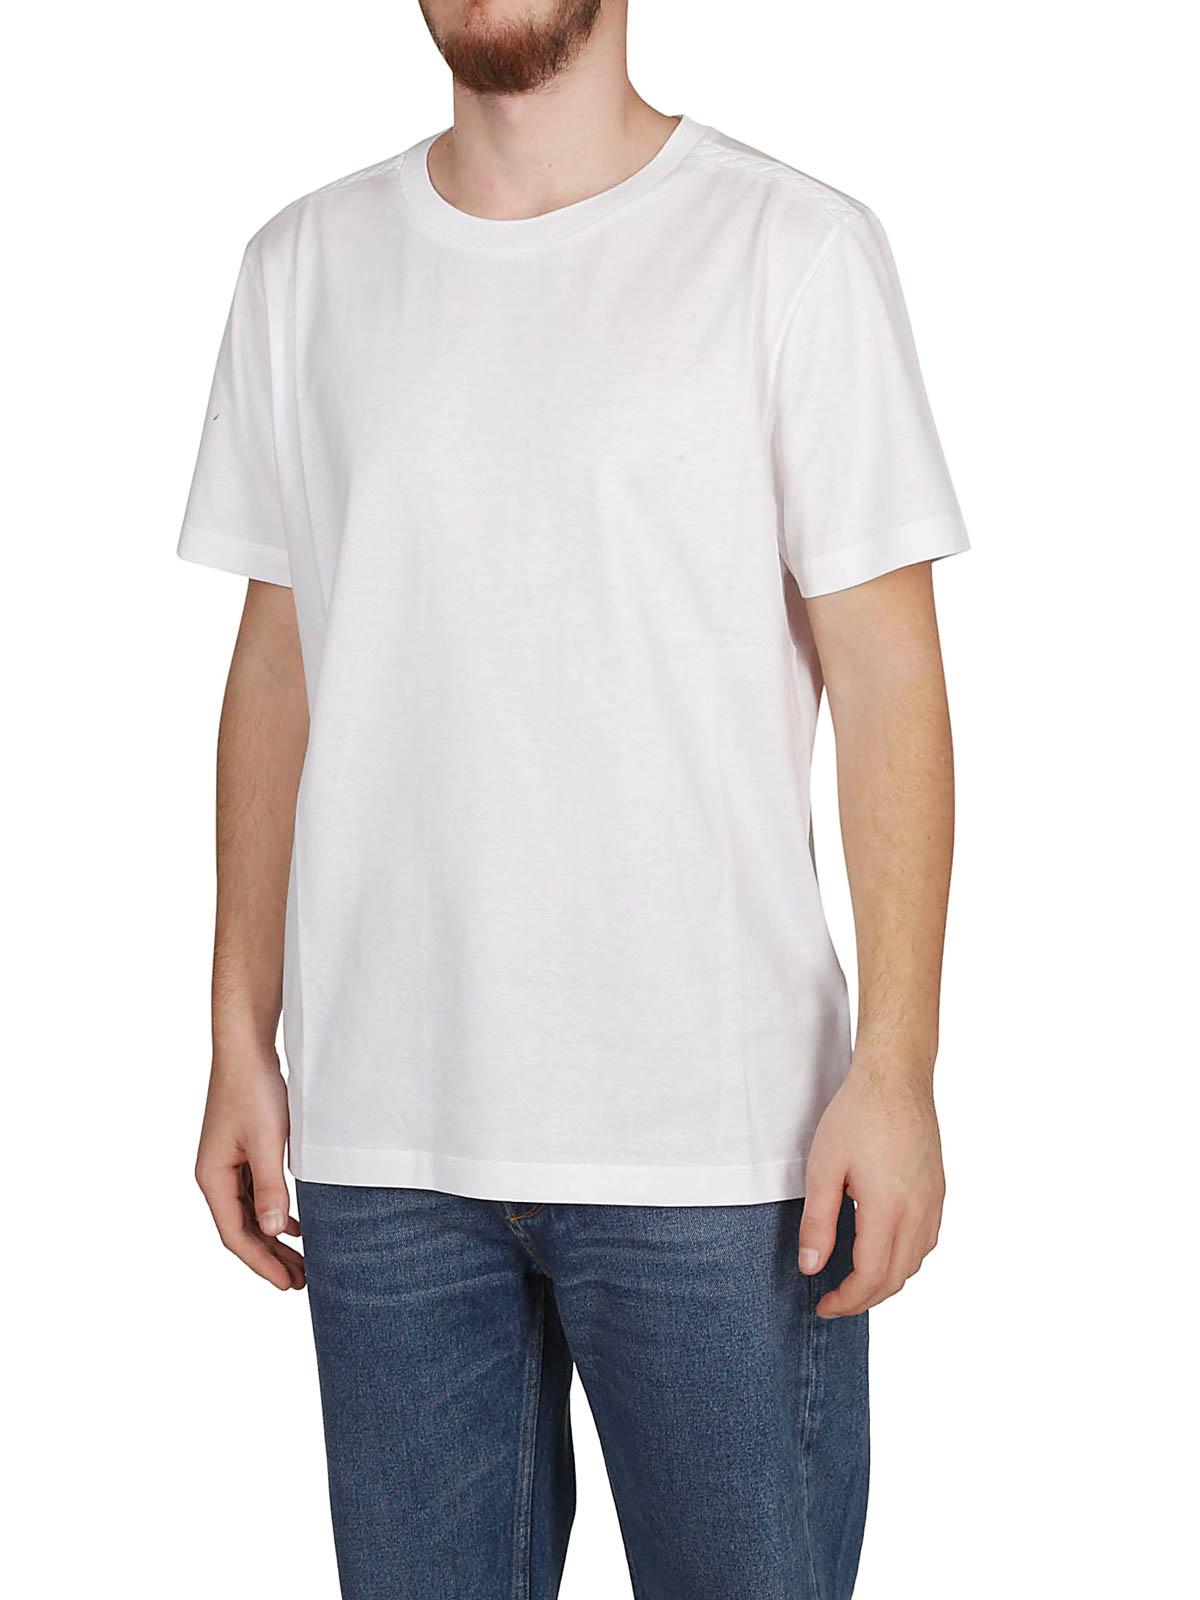 f519068658d2b BOTTEGA VENETA: t-shirts online - Intrecciato pattern white T-shirt